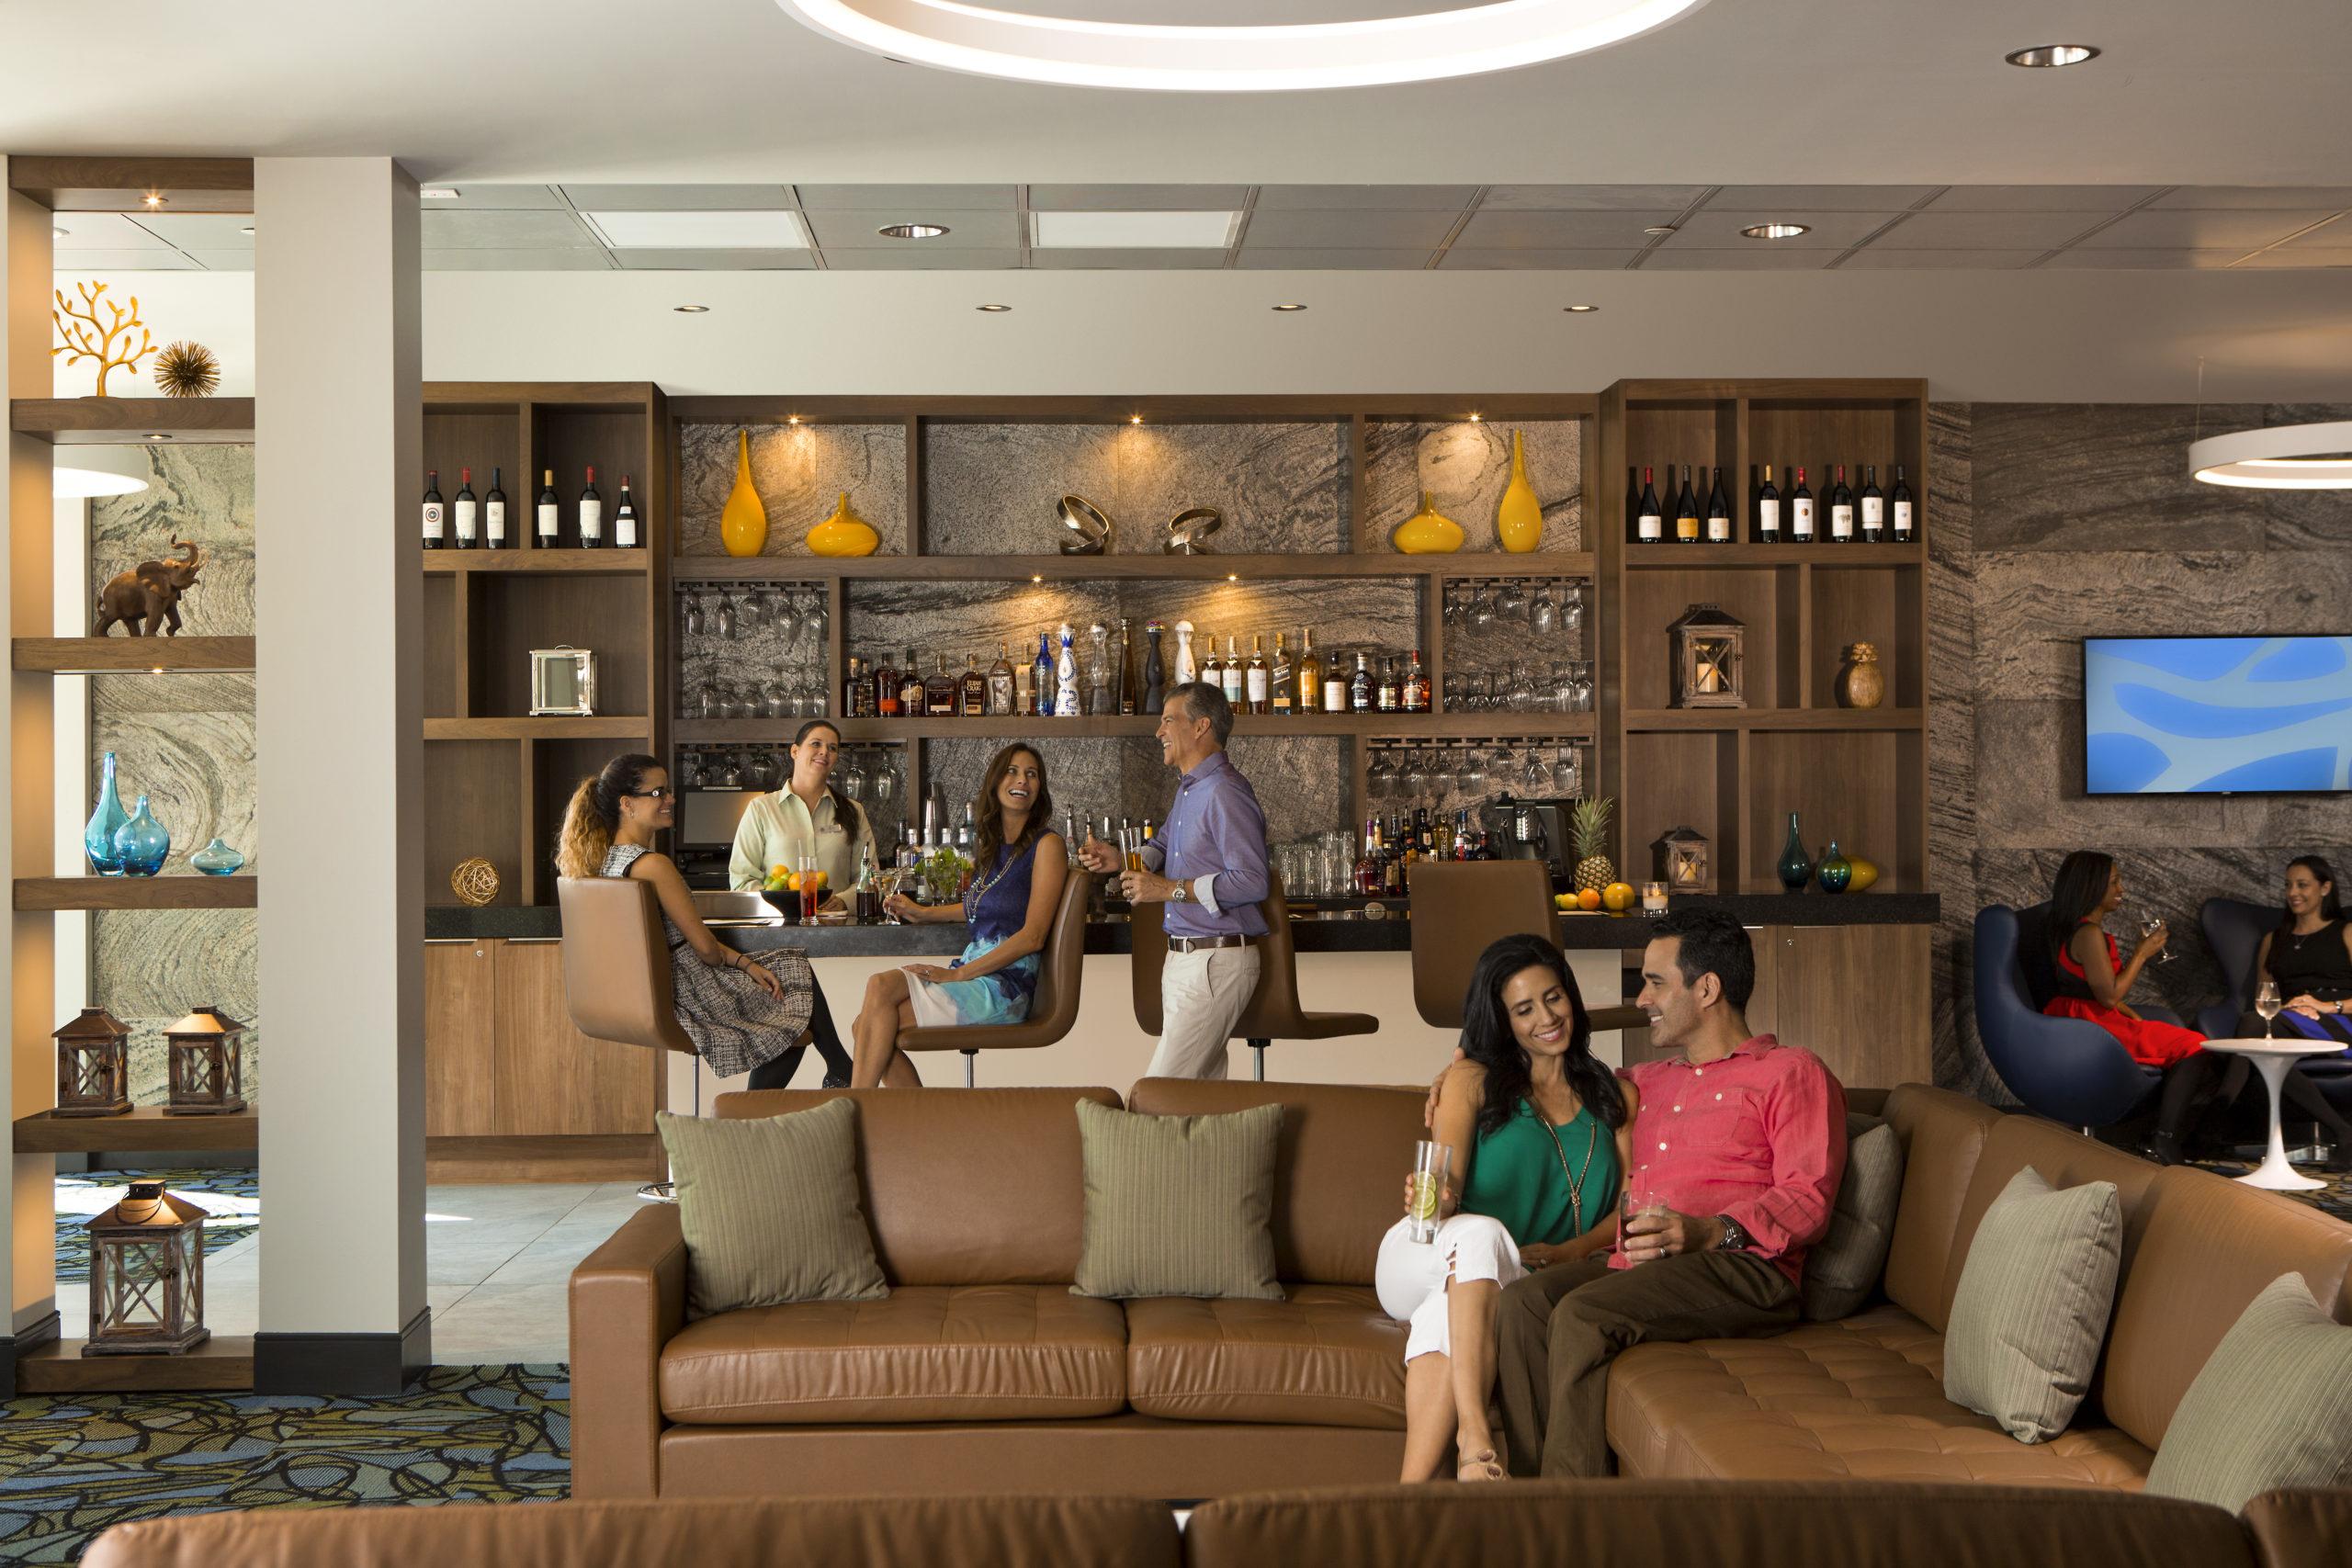 Element Bar - the grove resort orlando - homesbyrau